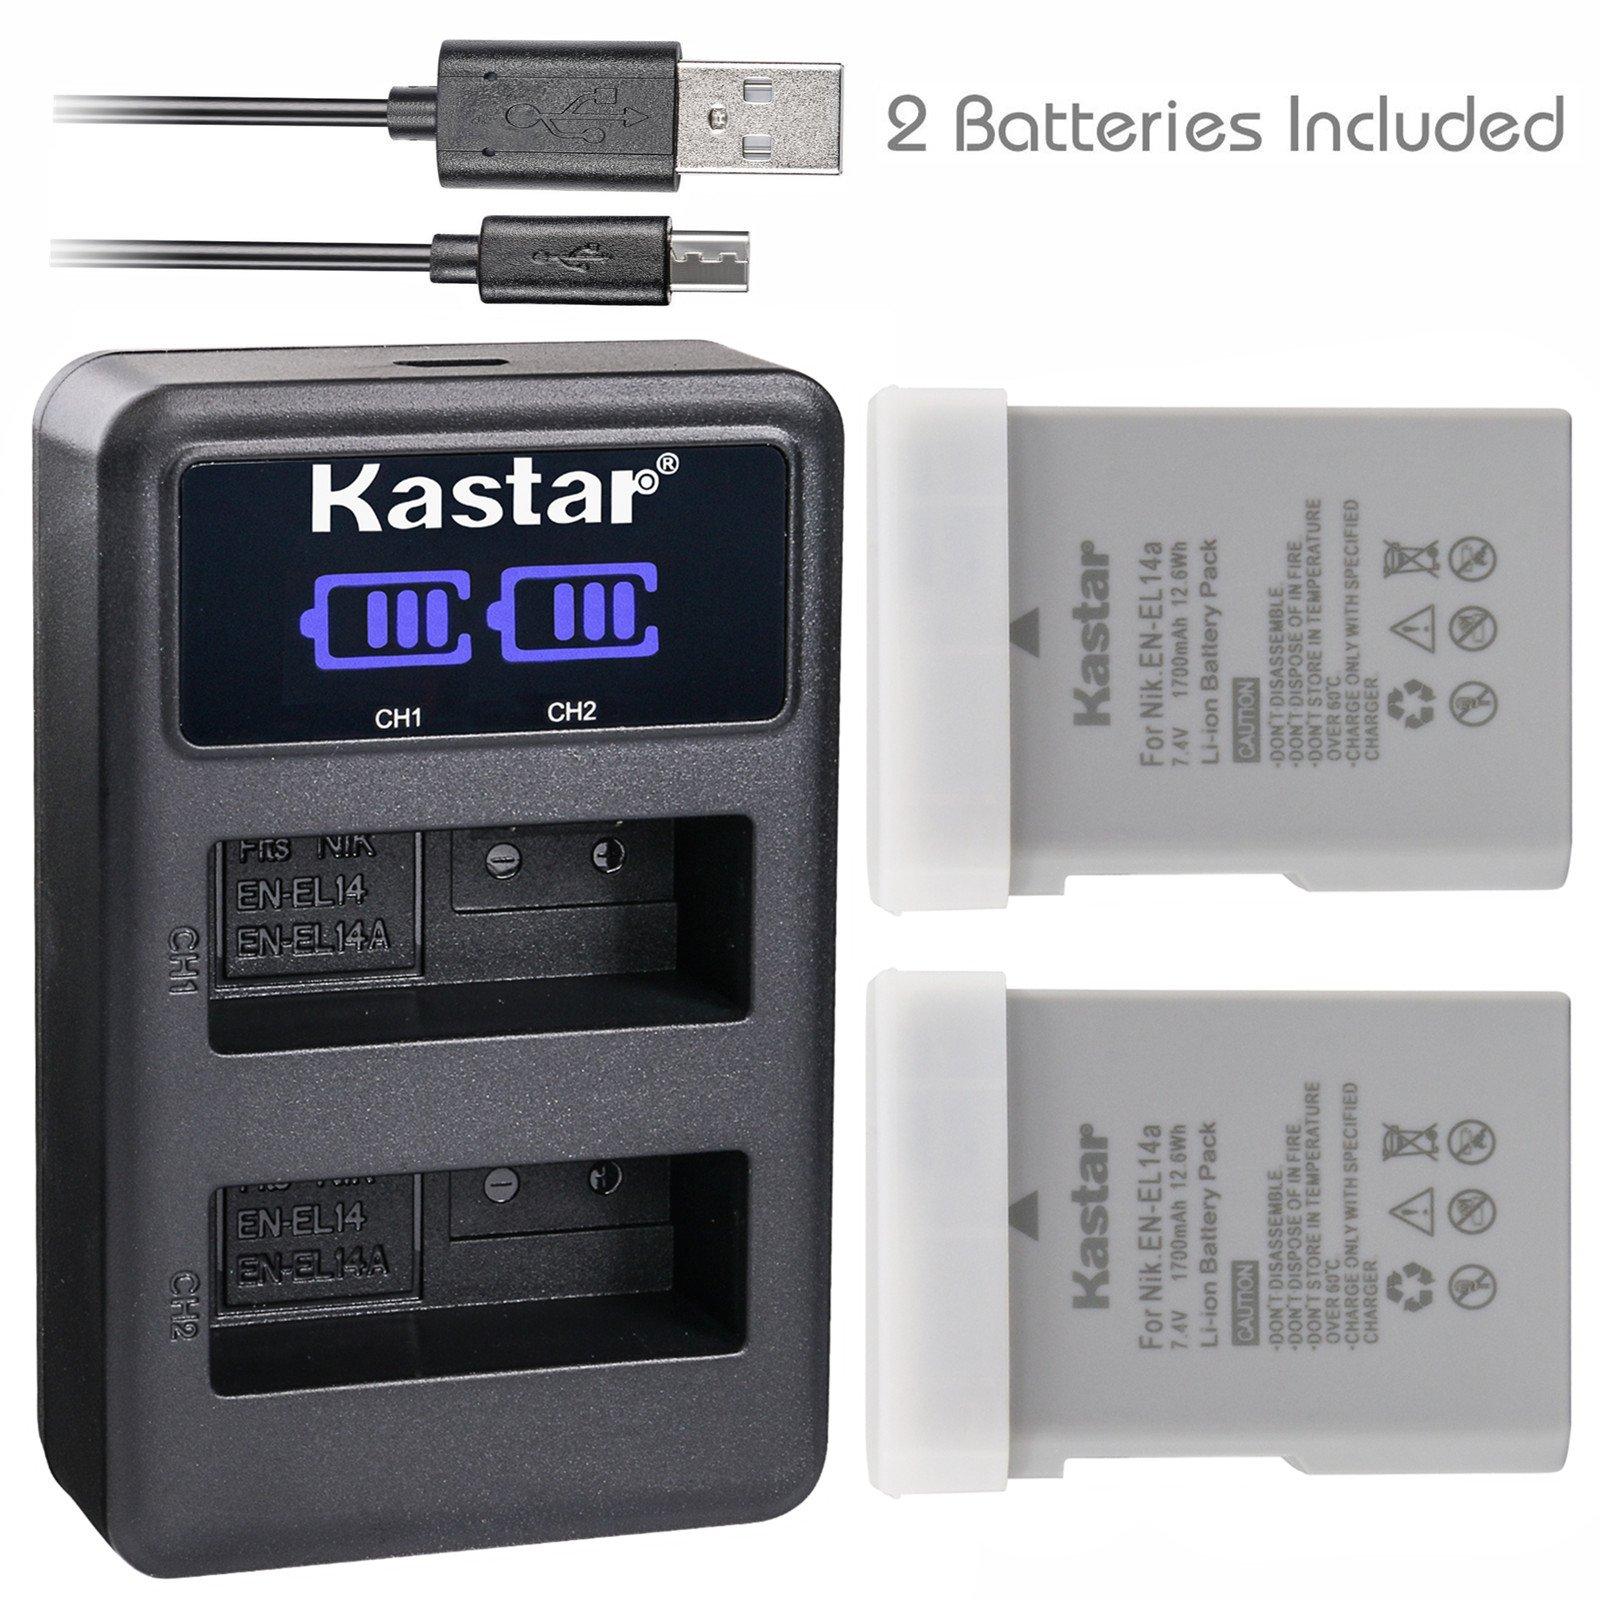 Kastar Battery X2 & LCD Dual Charger for Nikon EN-EL14a EN-EL14 EL14a and Nikon Coolpix P7000 Coolpix P7100 Coolpix P7700 Coolpix P7800 D3100 D3200 D3300 D3400 D5100 D5300 D5500 D5600 Df DSLR Camera